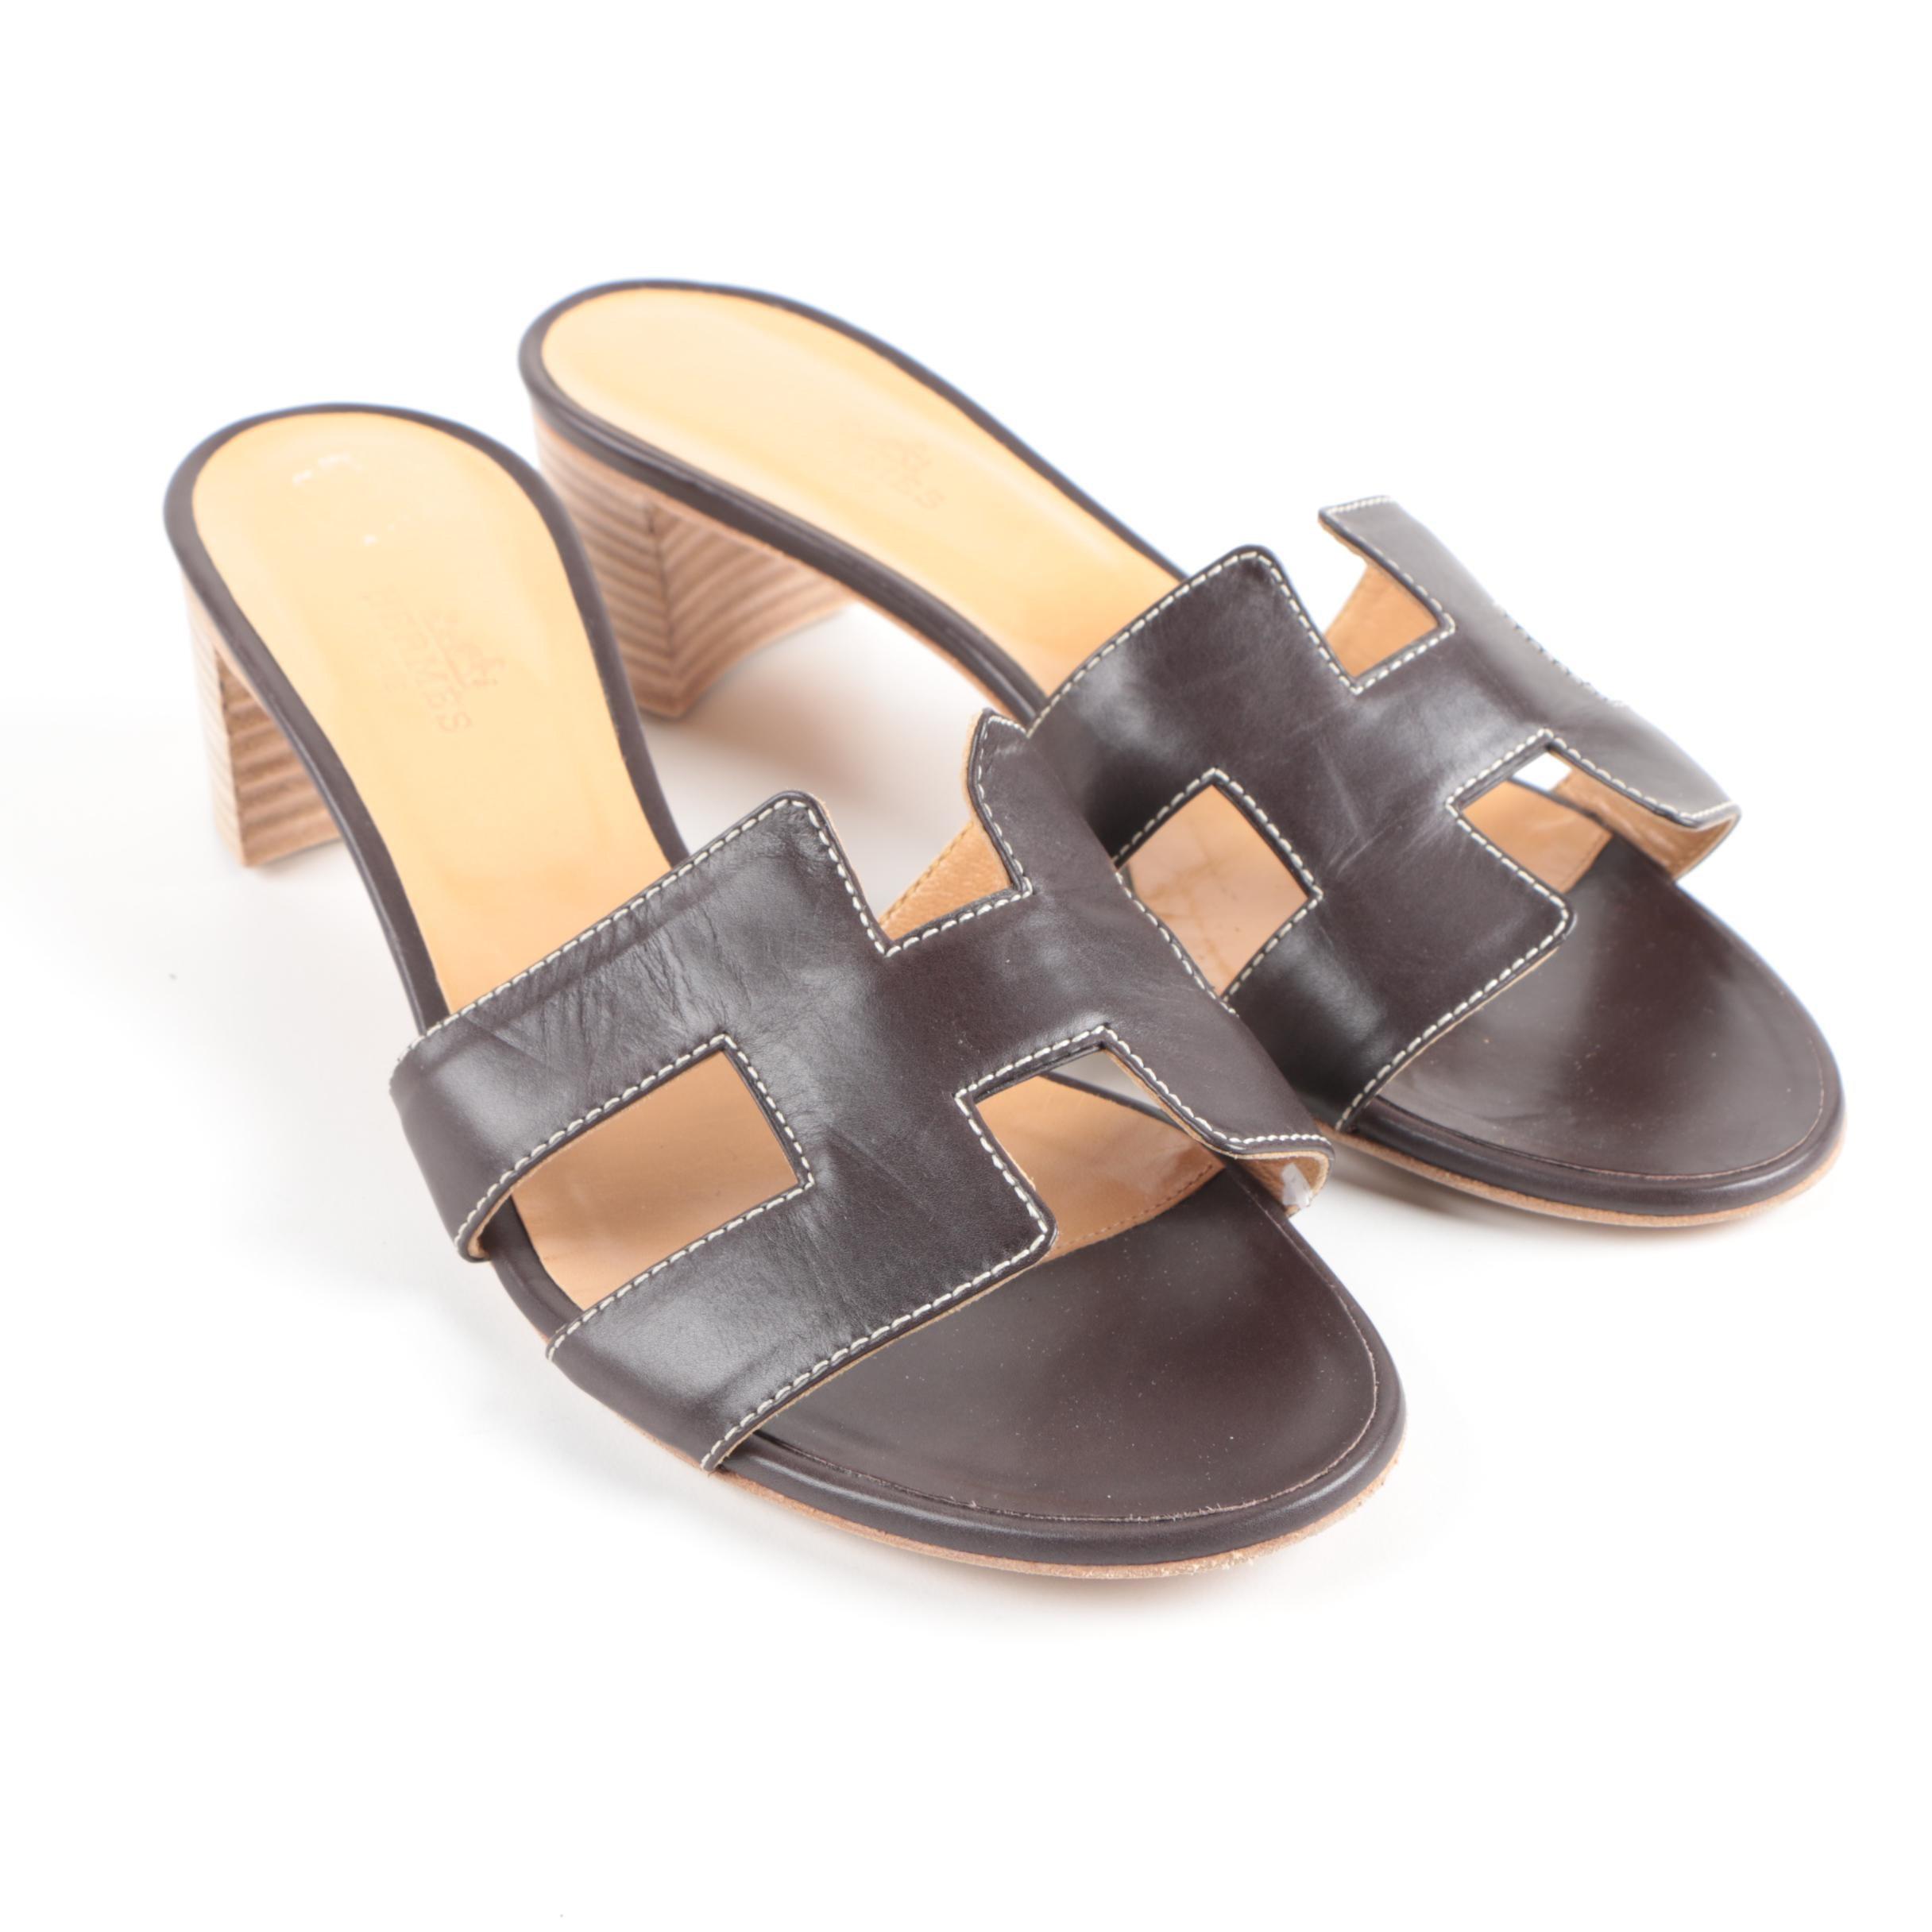 Hermès Oasis Sandals